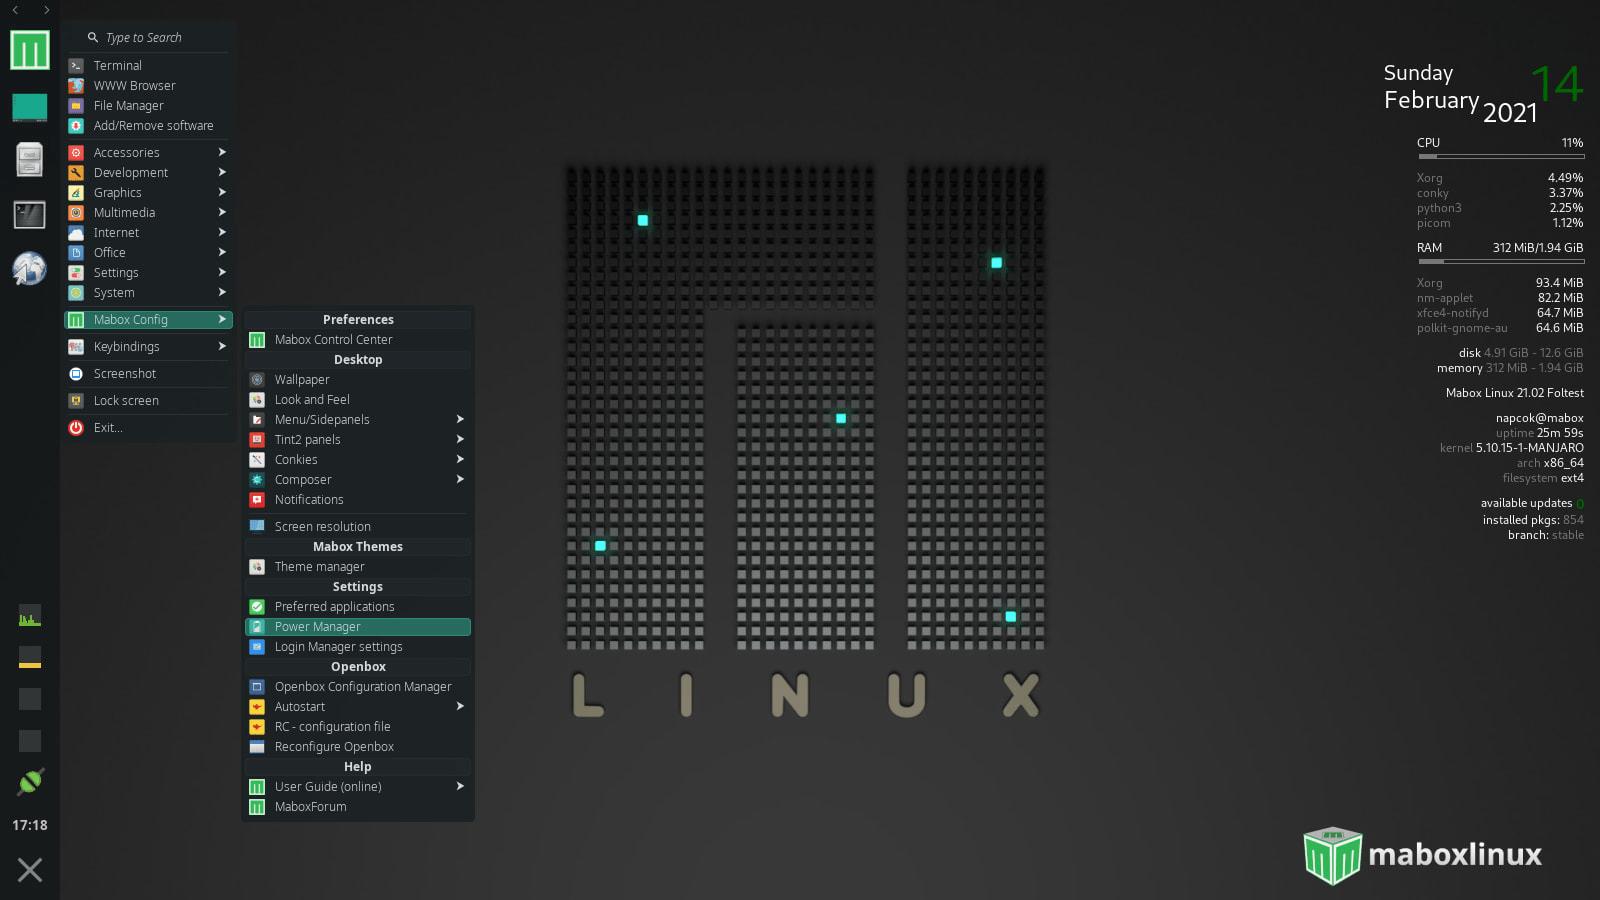 "MaboxLinux 21.02 (""Foltest"") mit Openbox 3.6.1 und Conky 1.11.6"